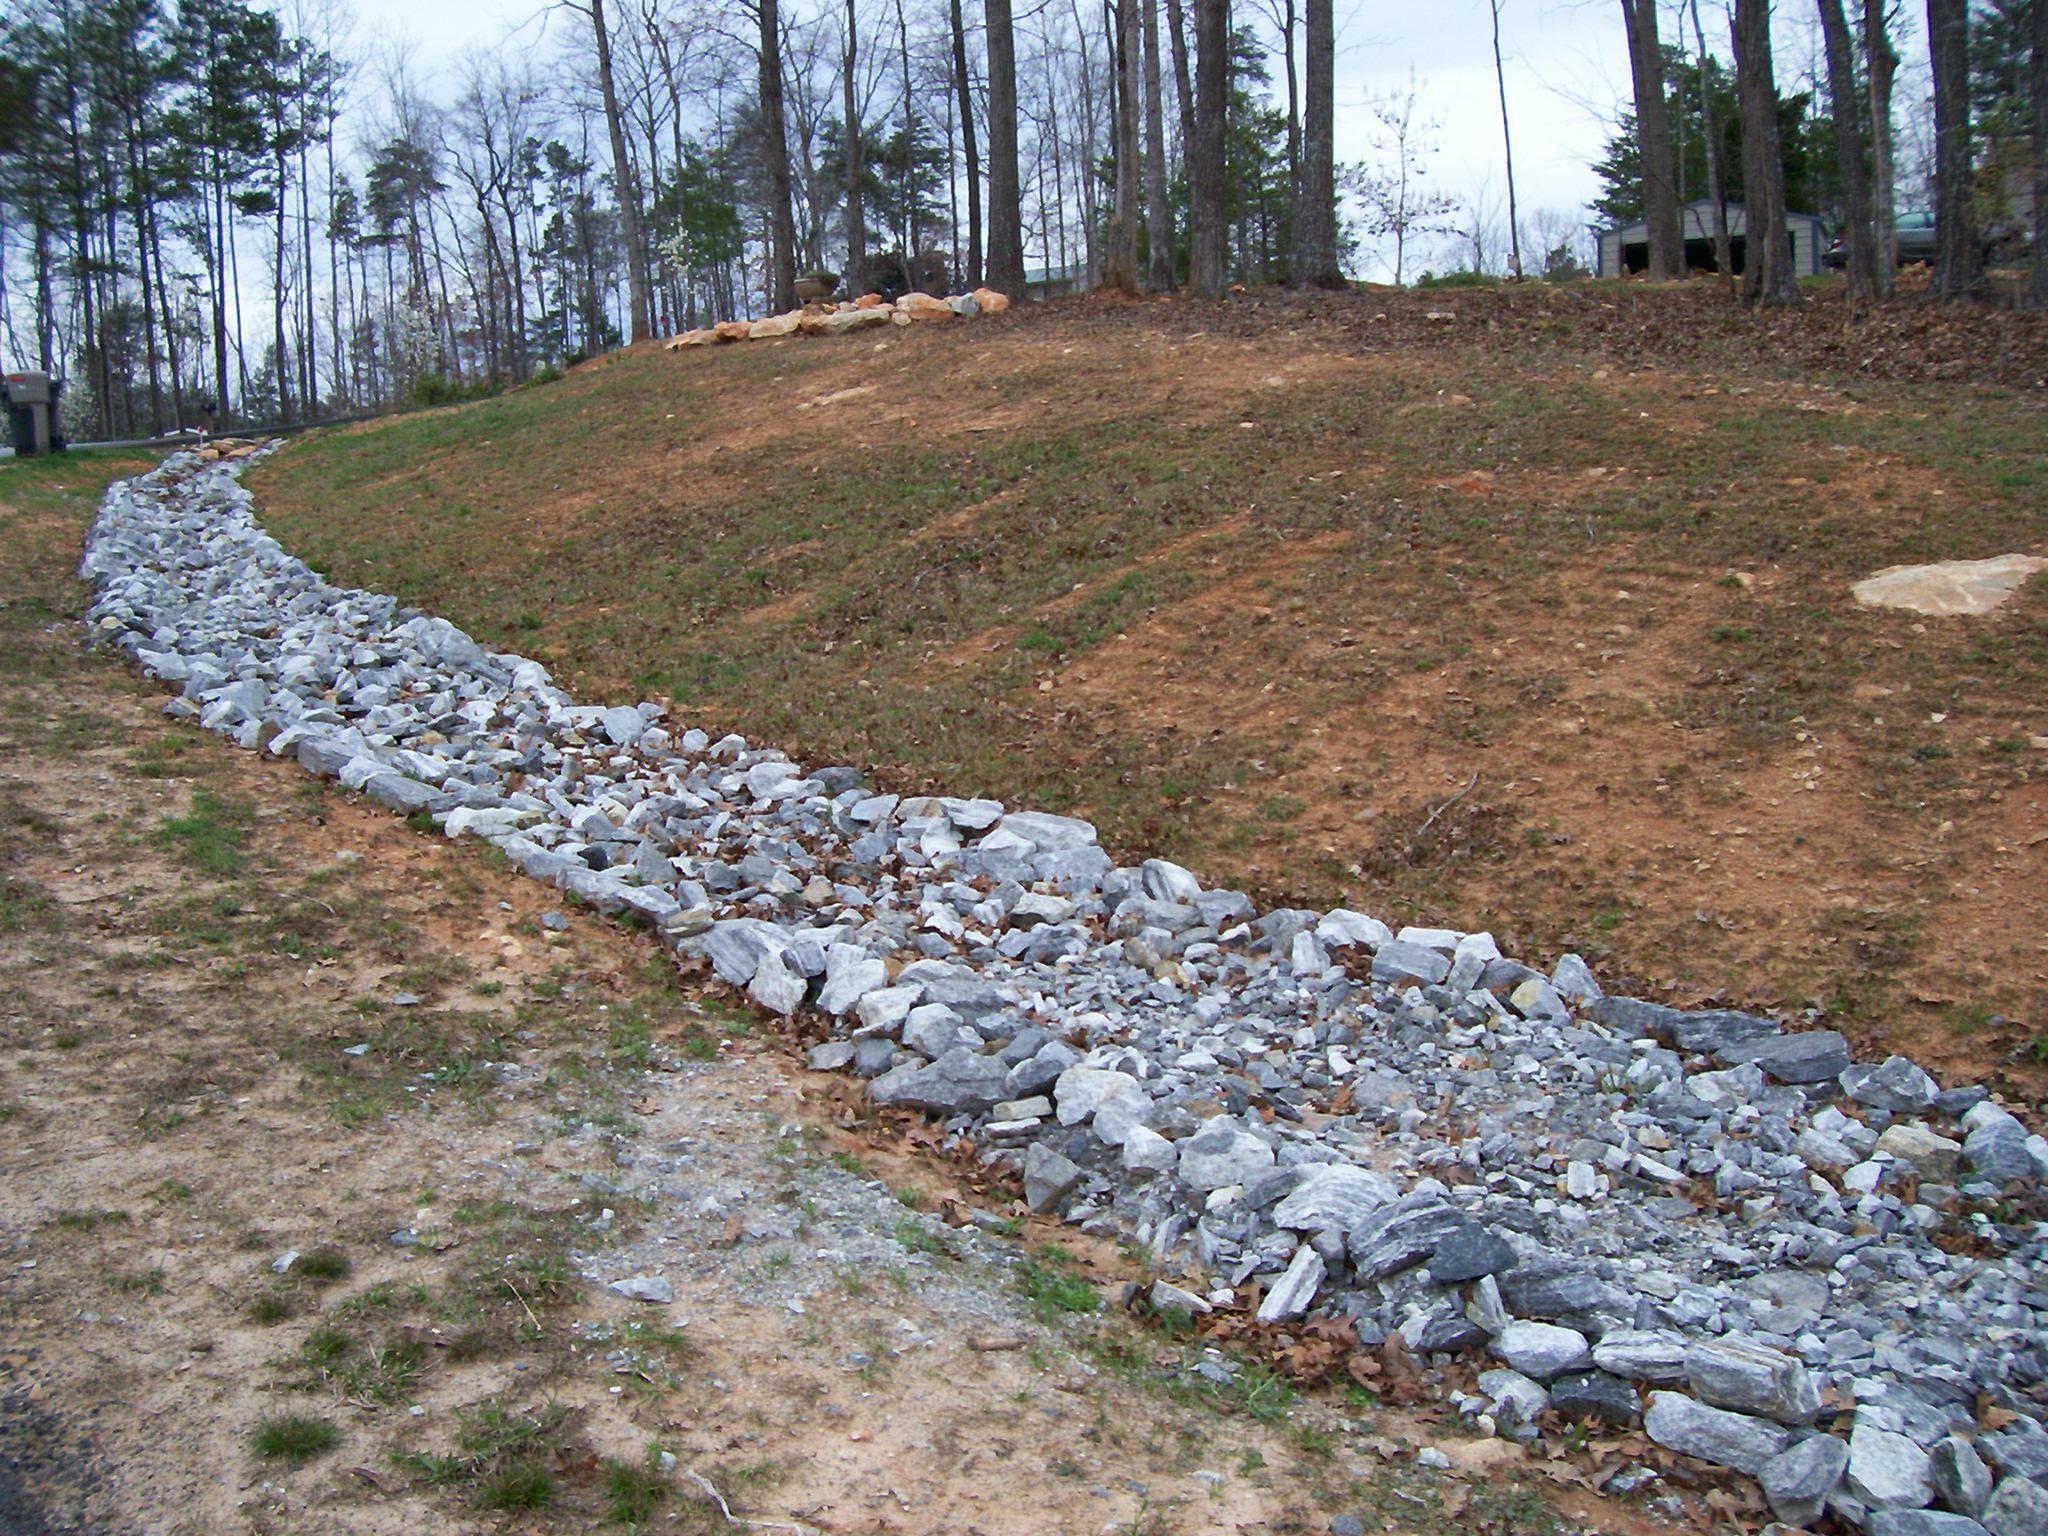 Surge Stone Creek Bed. Dahlonega, GA Dry Creek Beds